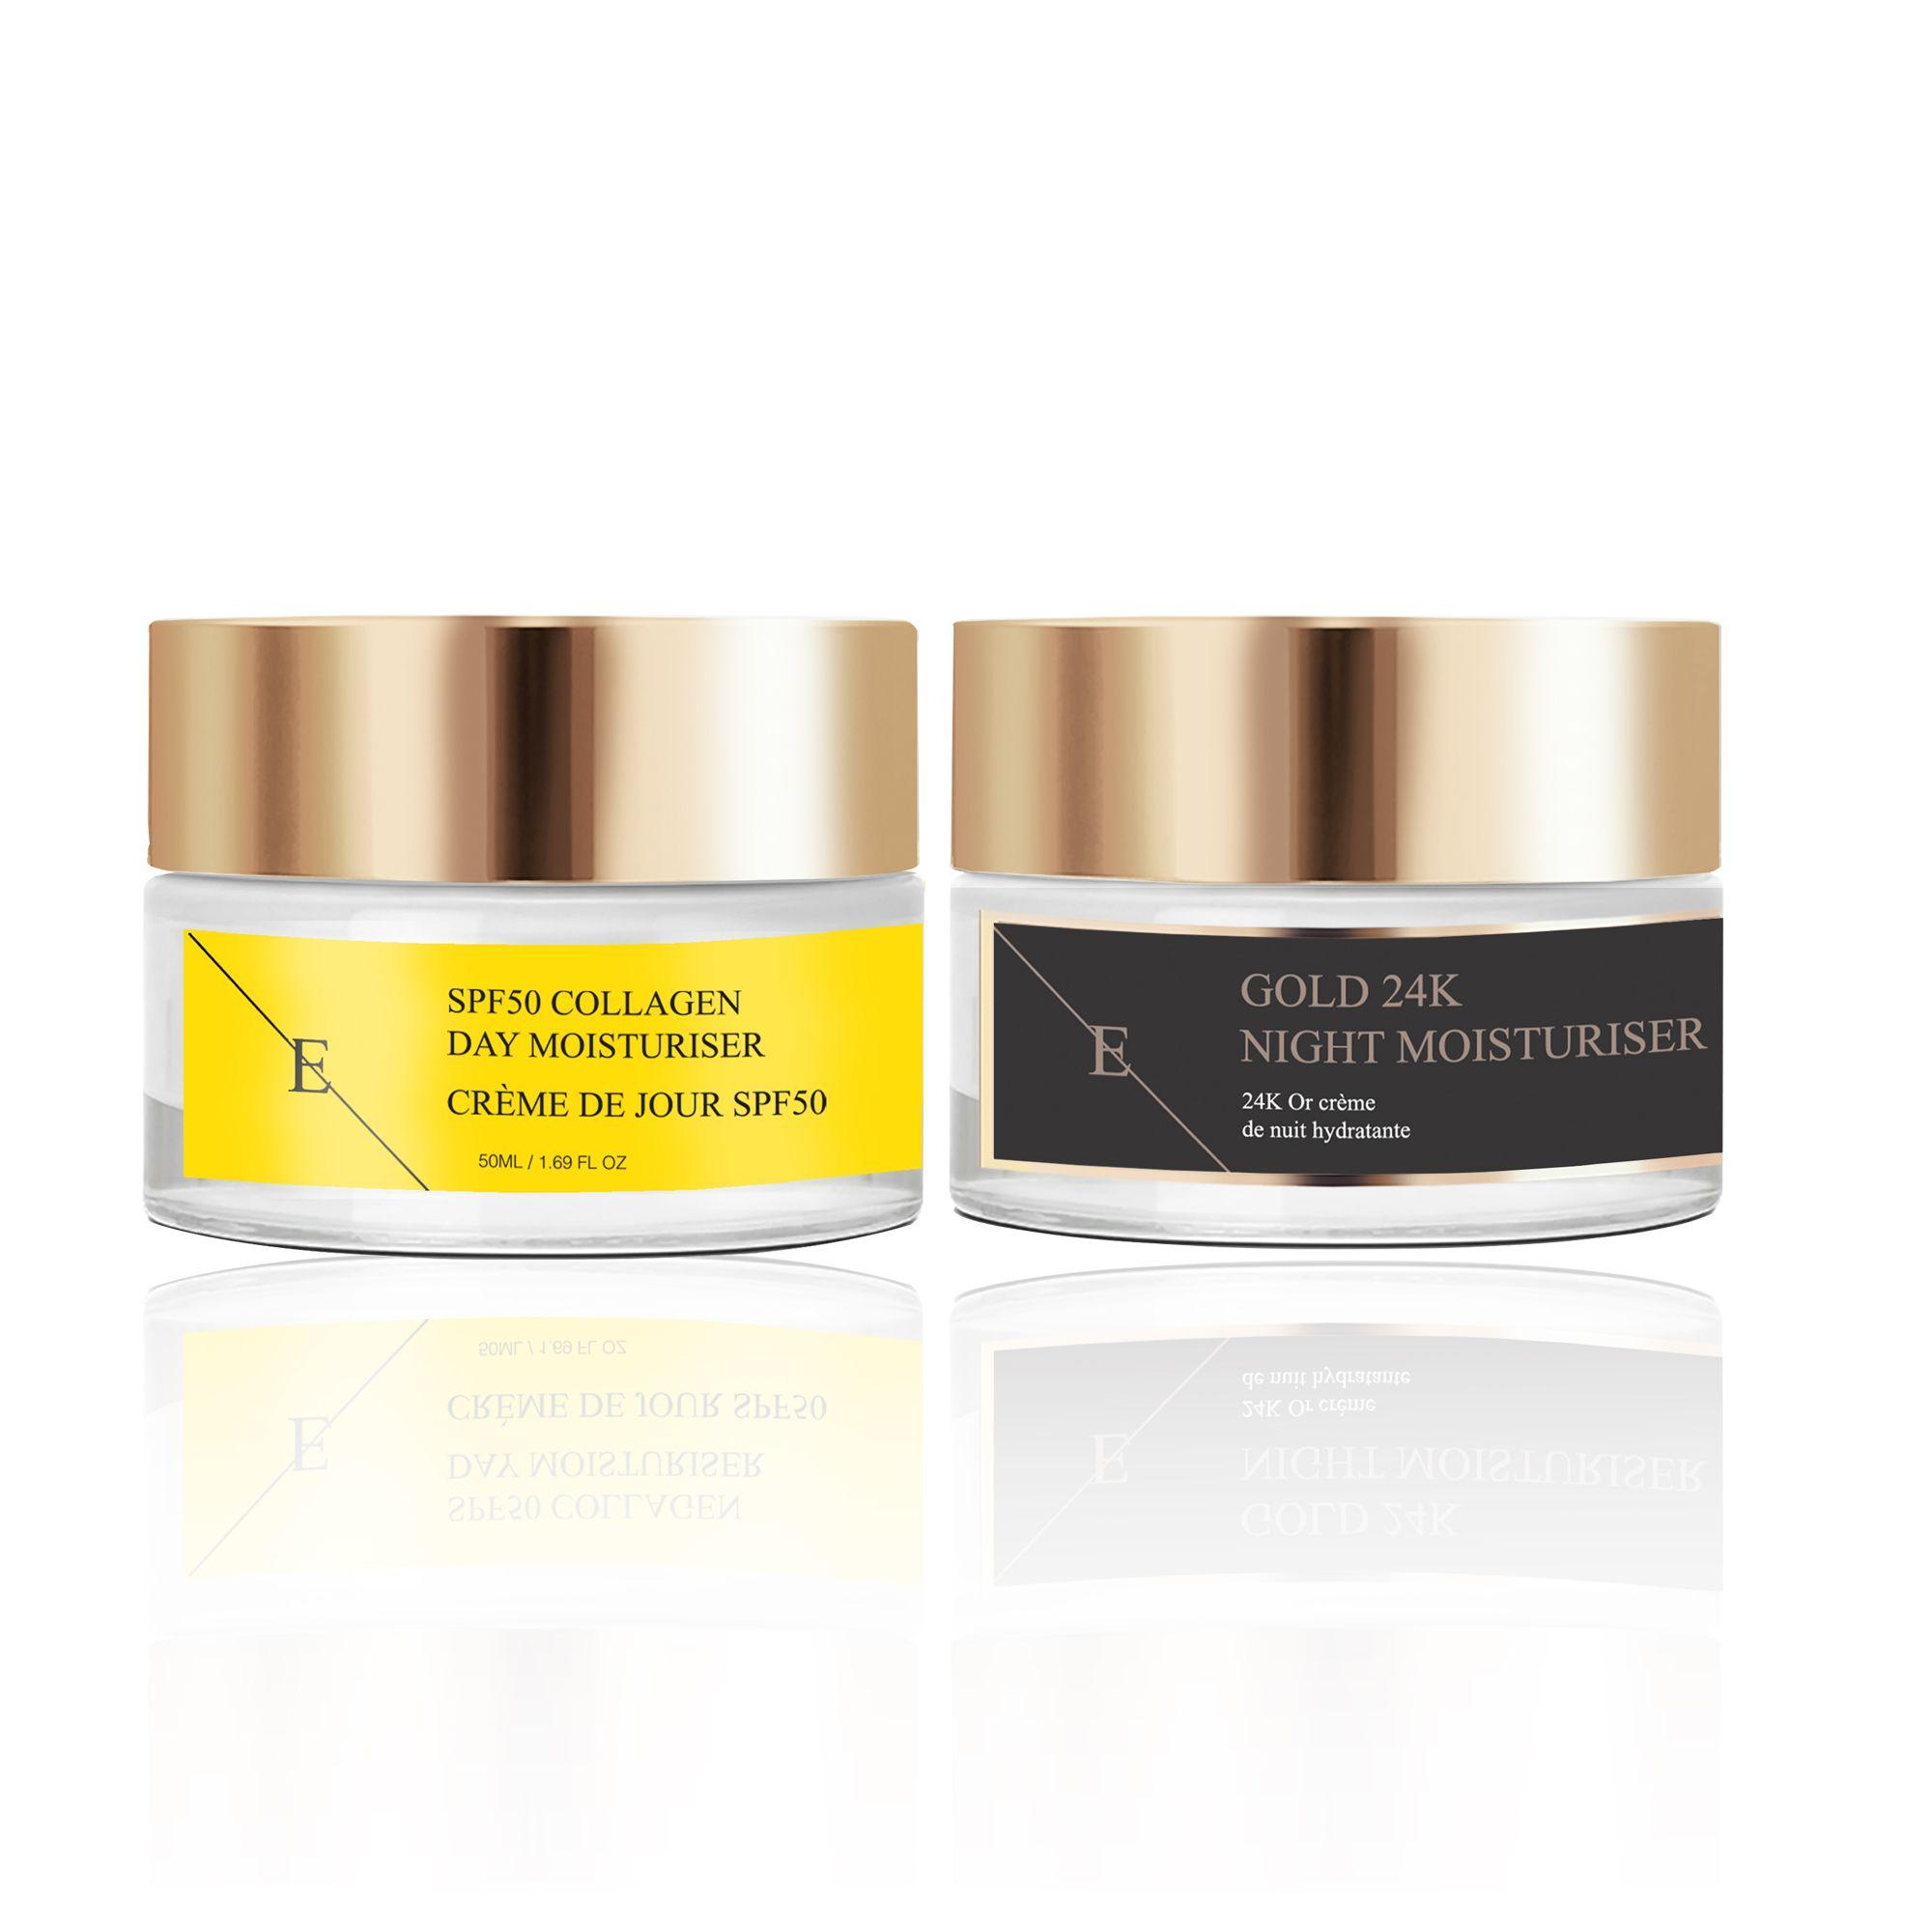 SPF50 Collagen Day Cream 50ml + Anti-Wrinkle Night Moisturiser 24K Gold - 50ml